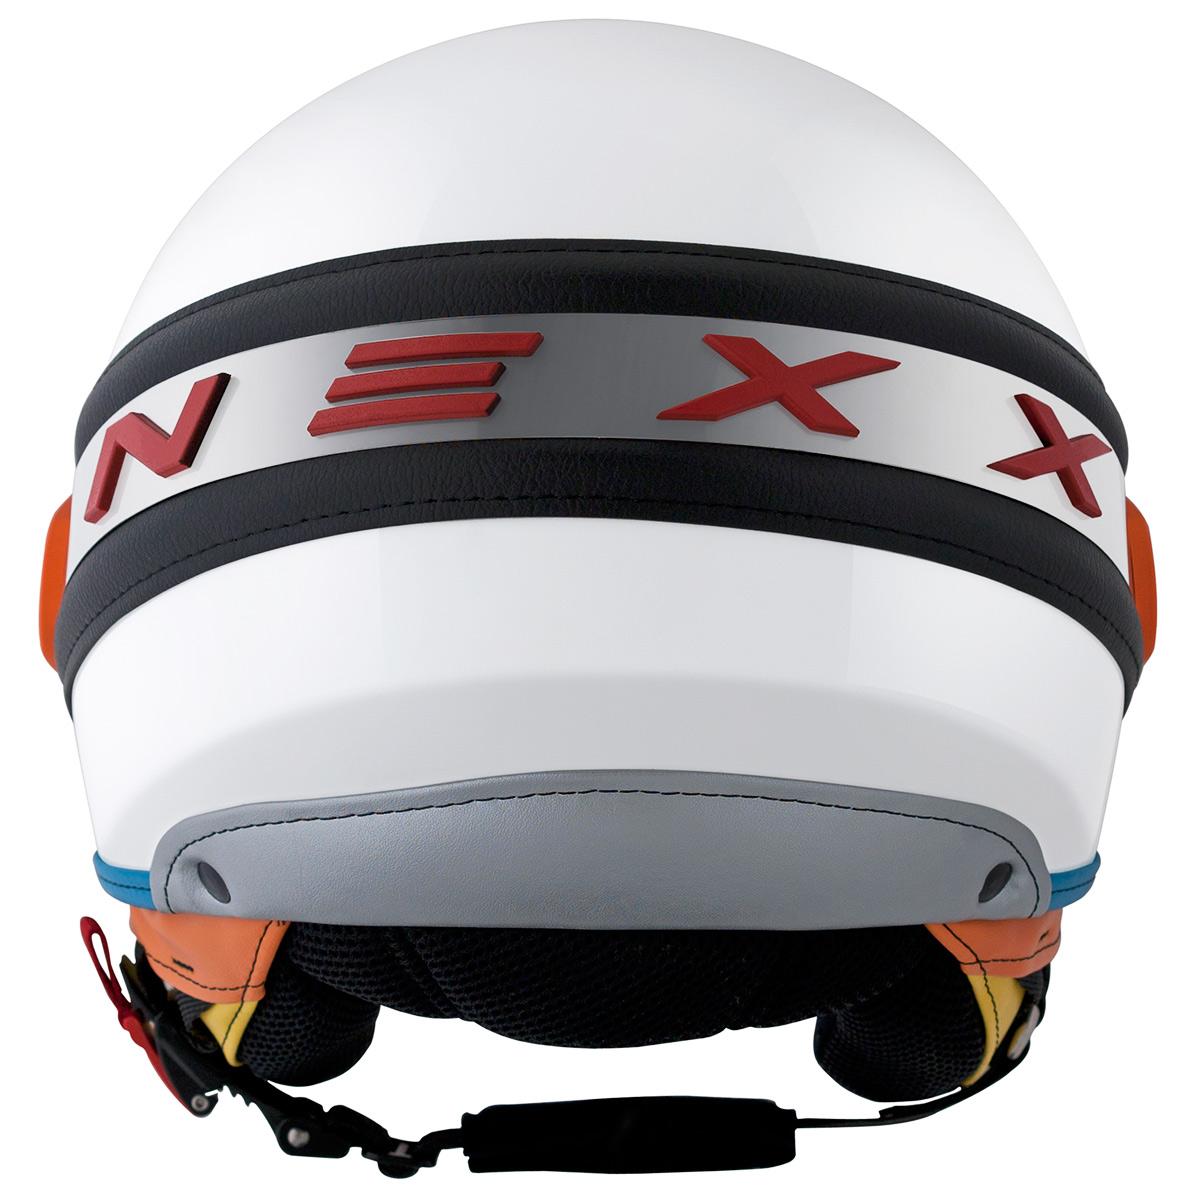 Capacete Nexx X60 Ice Pulp Vegas - Aberto  - Planet Bike Shop Moto Acessórios